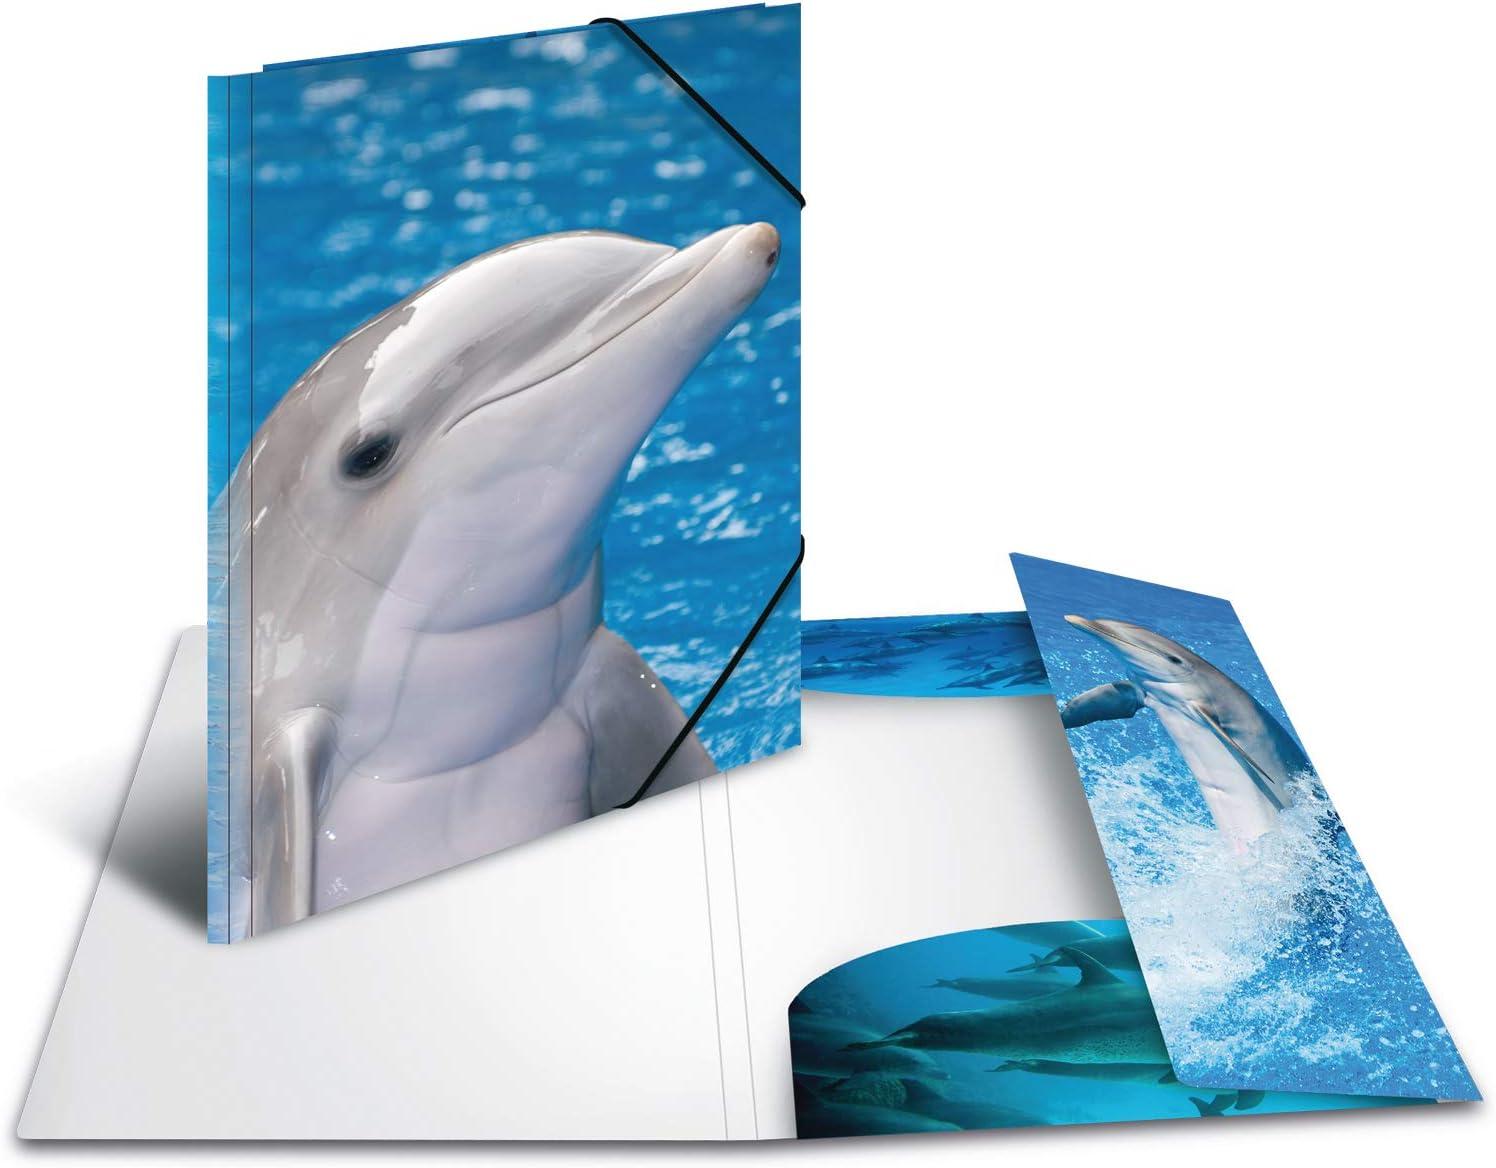 HERMA 7146 Polipropilene PP Blu Grigio cartella